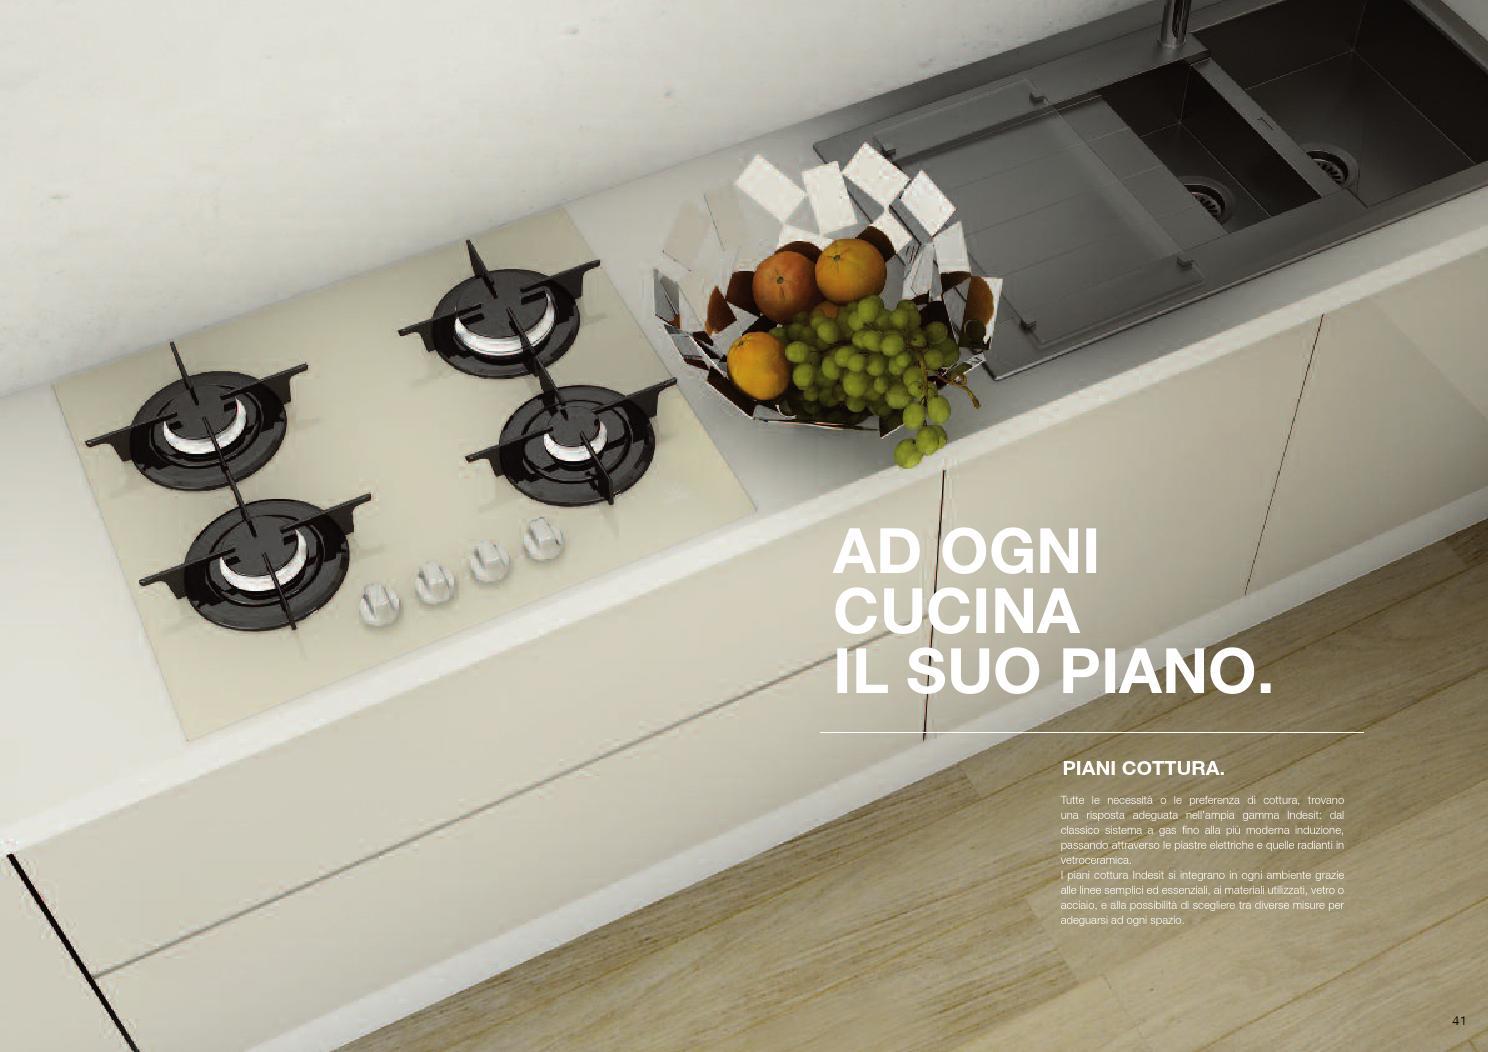 Piani cottura e coperchi ad incasso Indesit by ATA snc - issuu